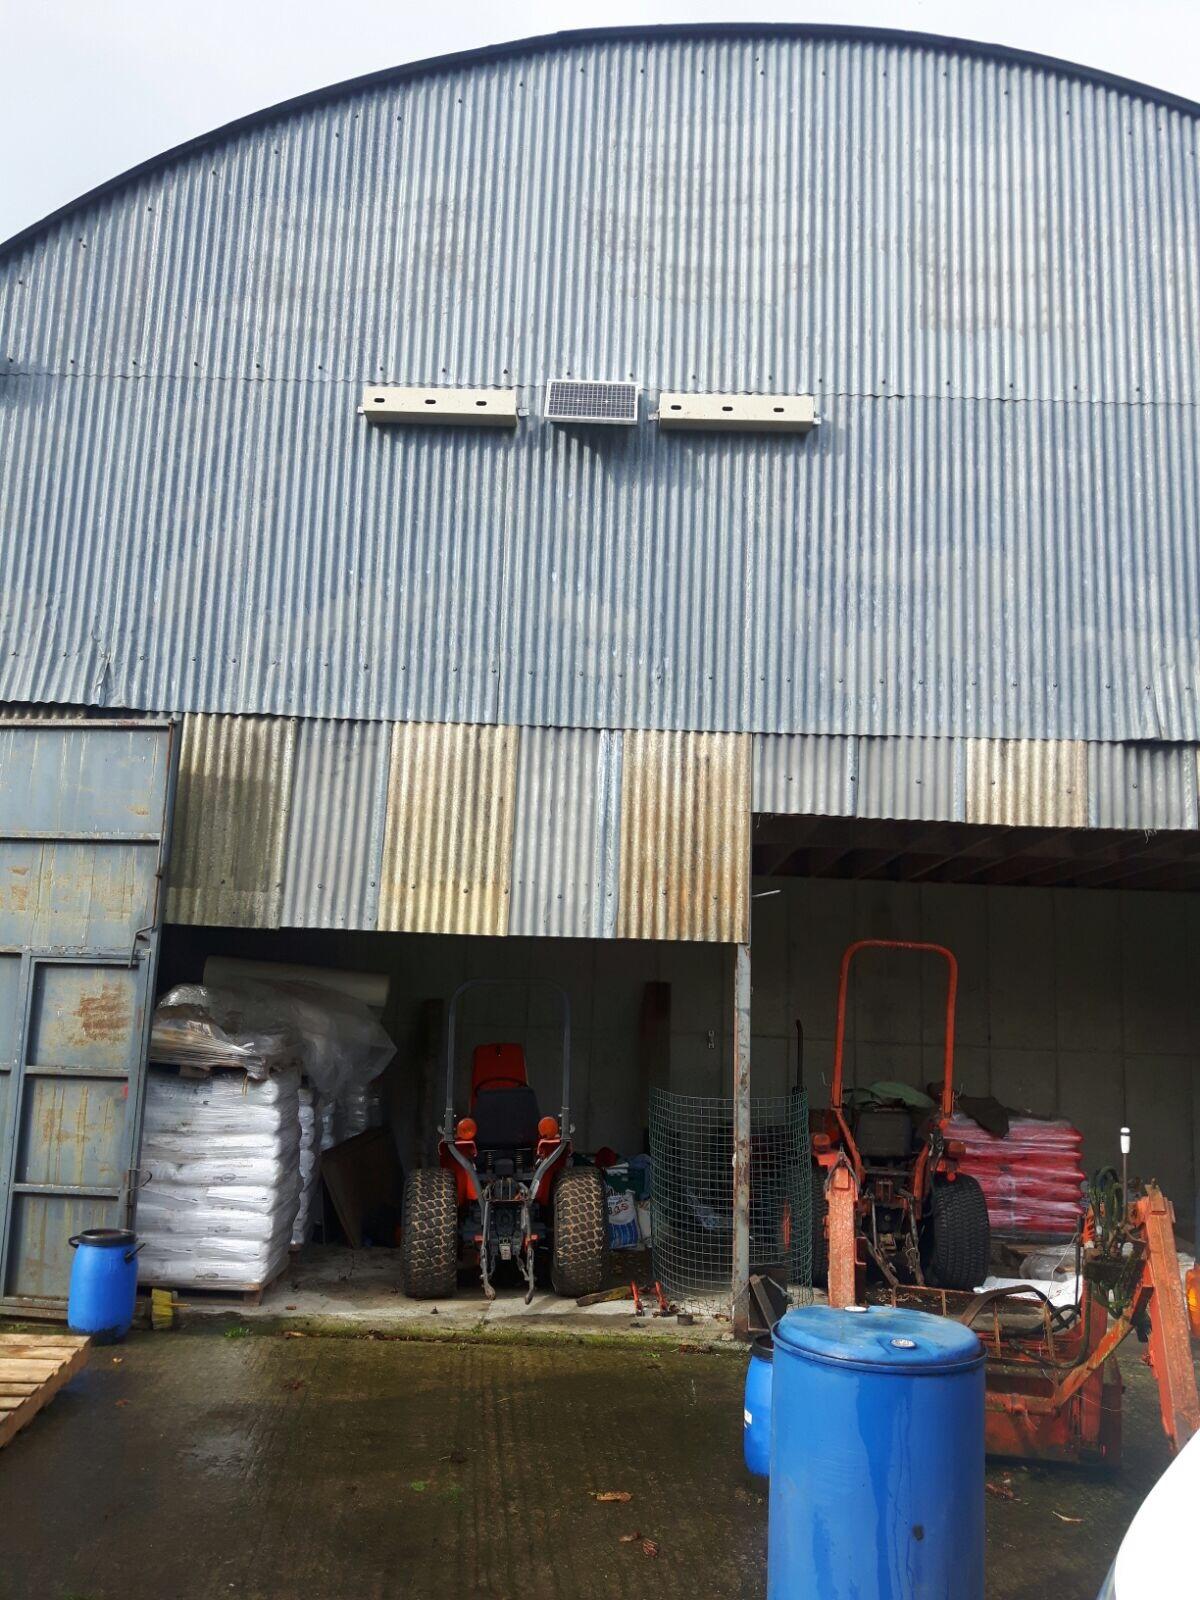 Genesis nest Box on farm building